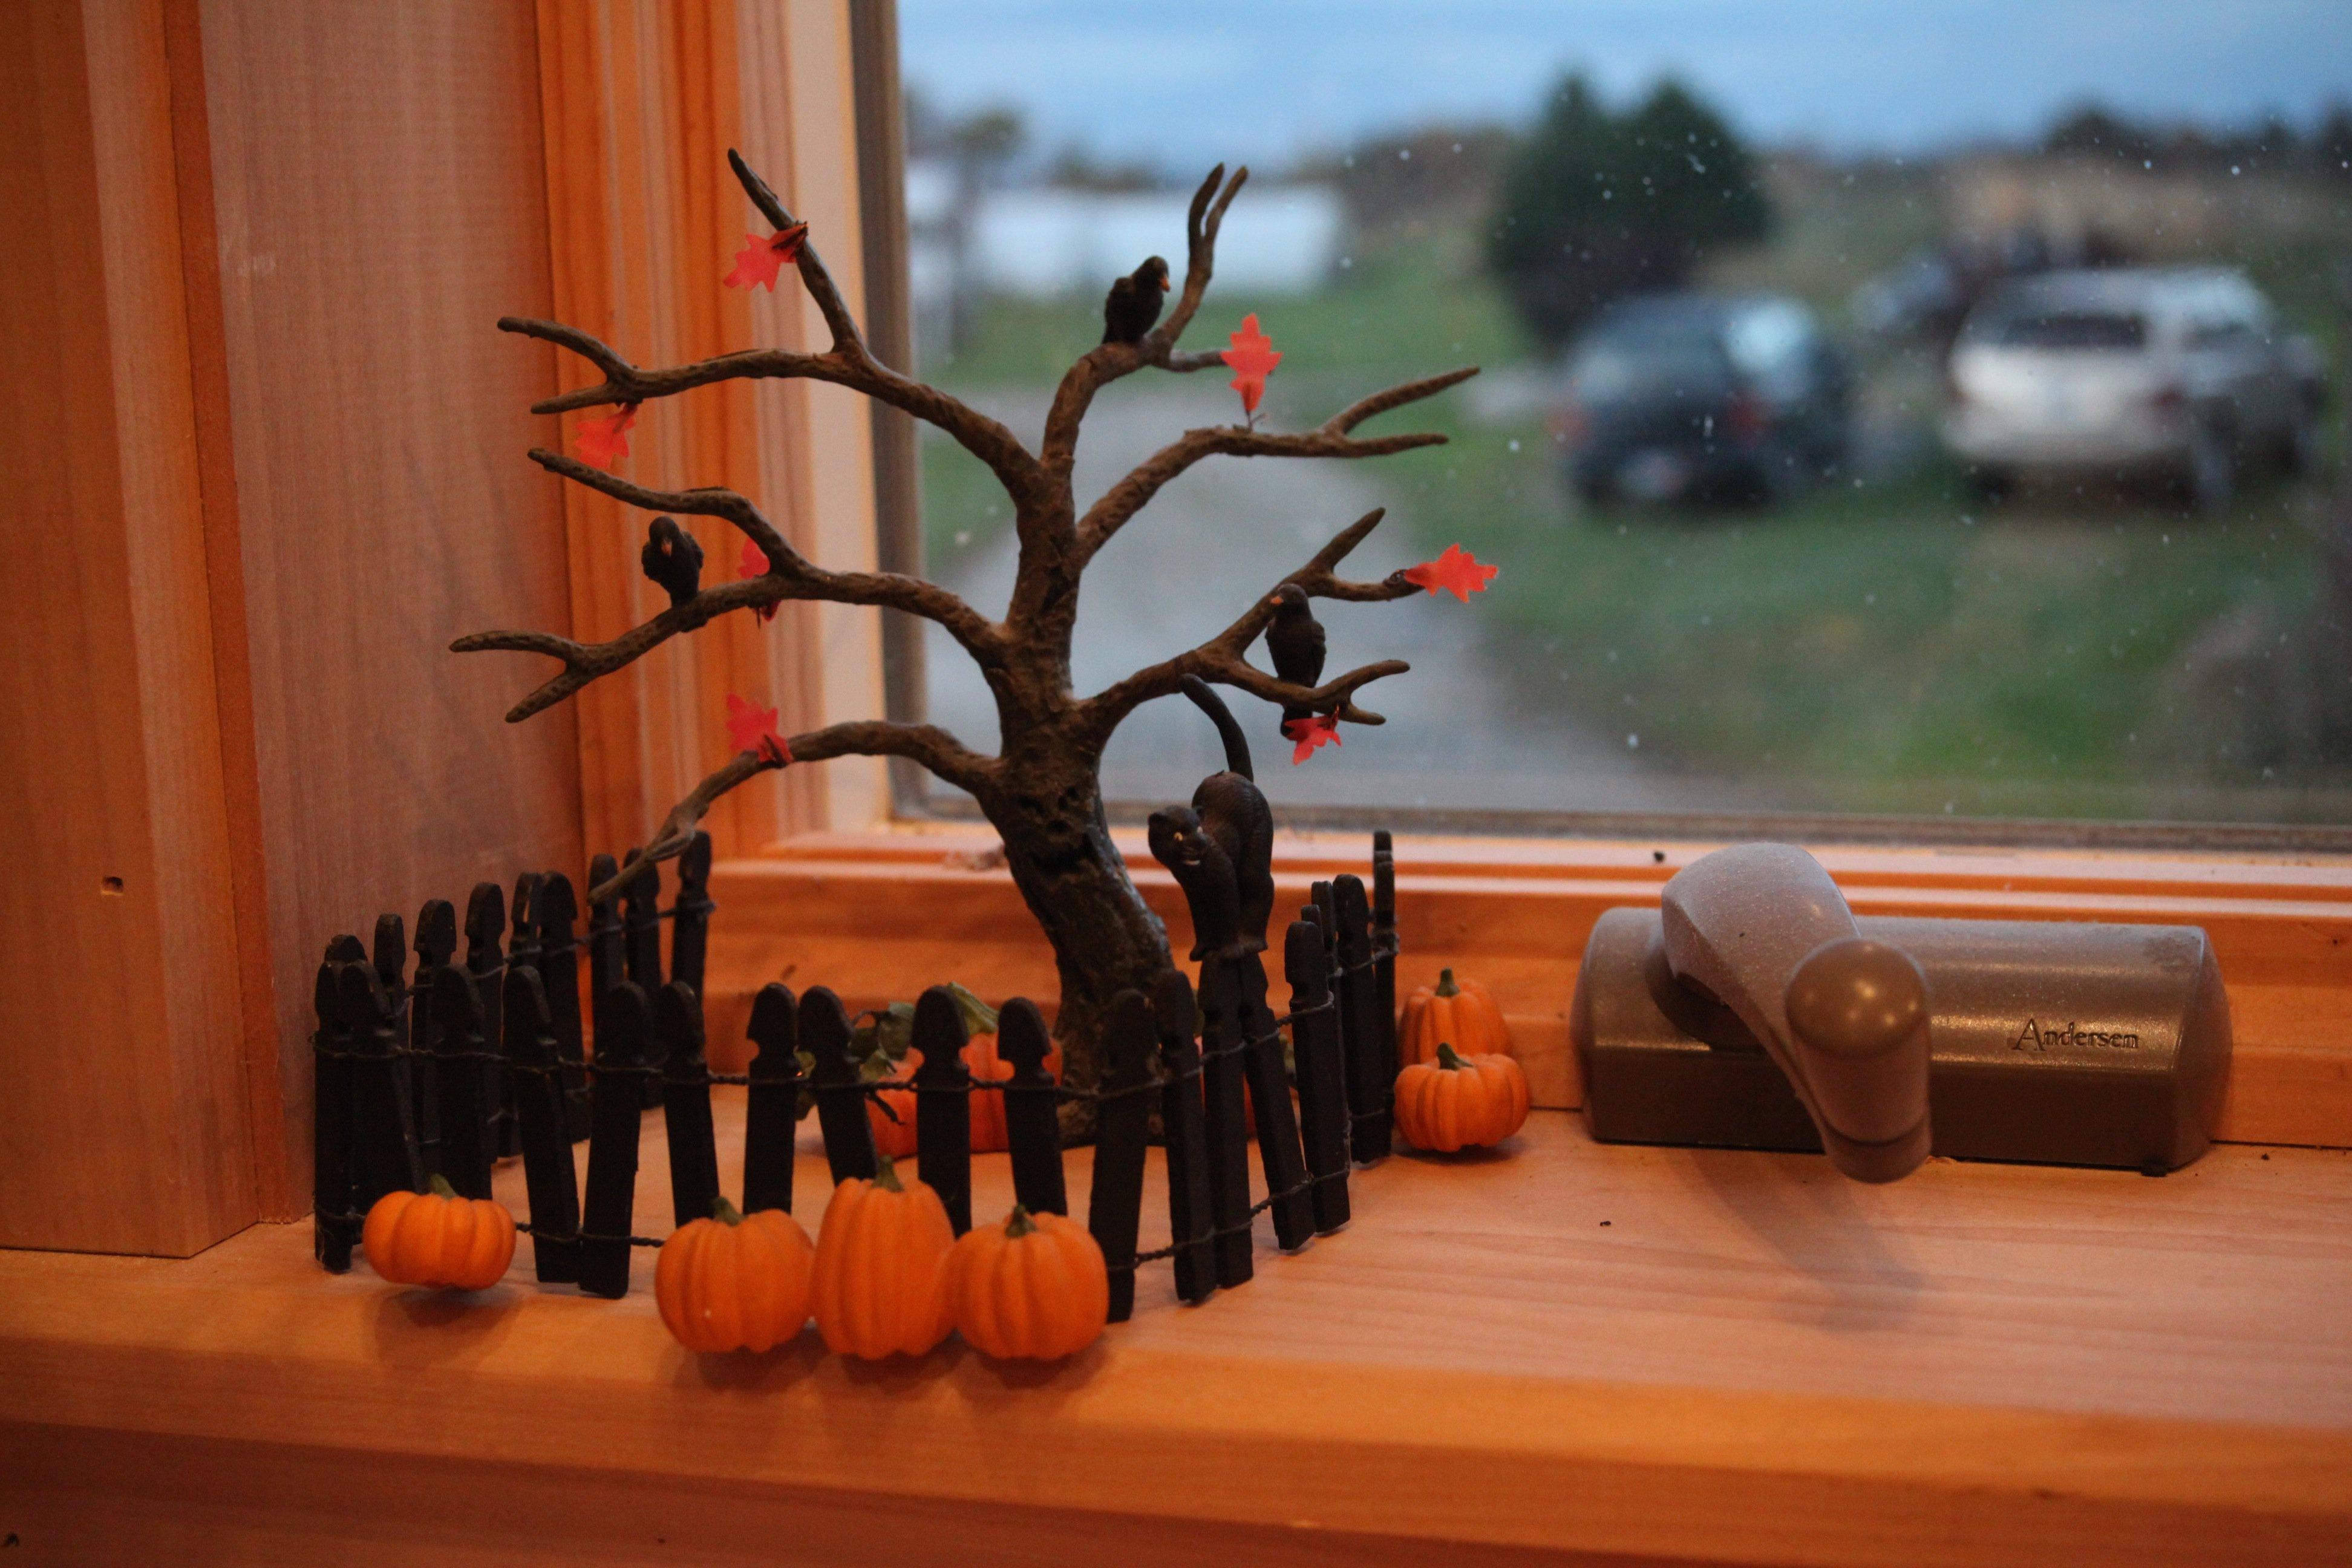 Oct windowsill decorations